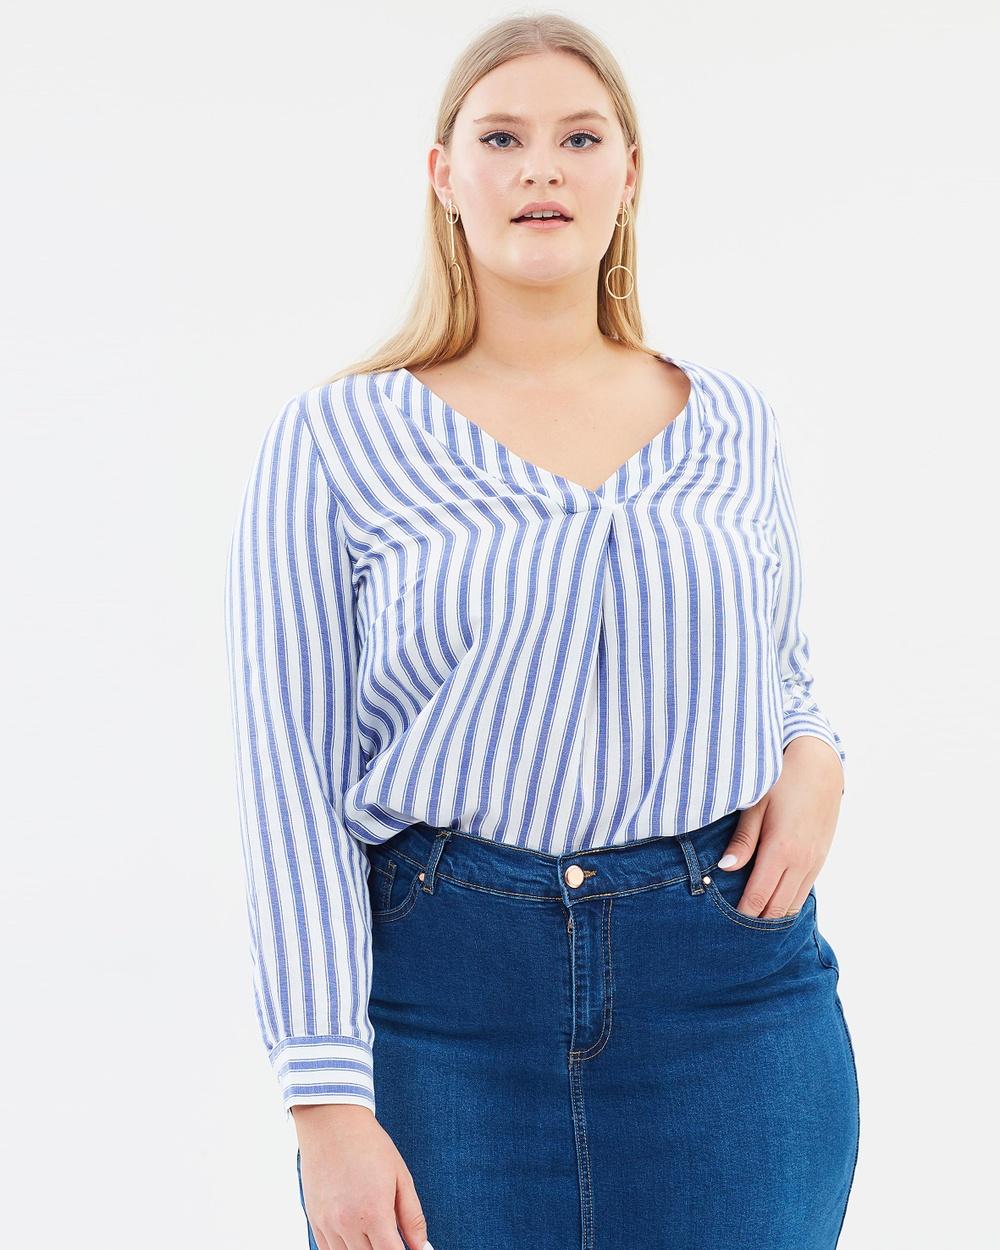 EVANS Striped Shirt Tops Blue Stripe Striped Shirt